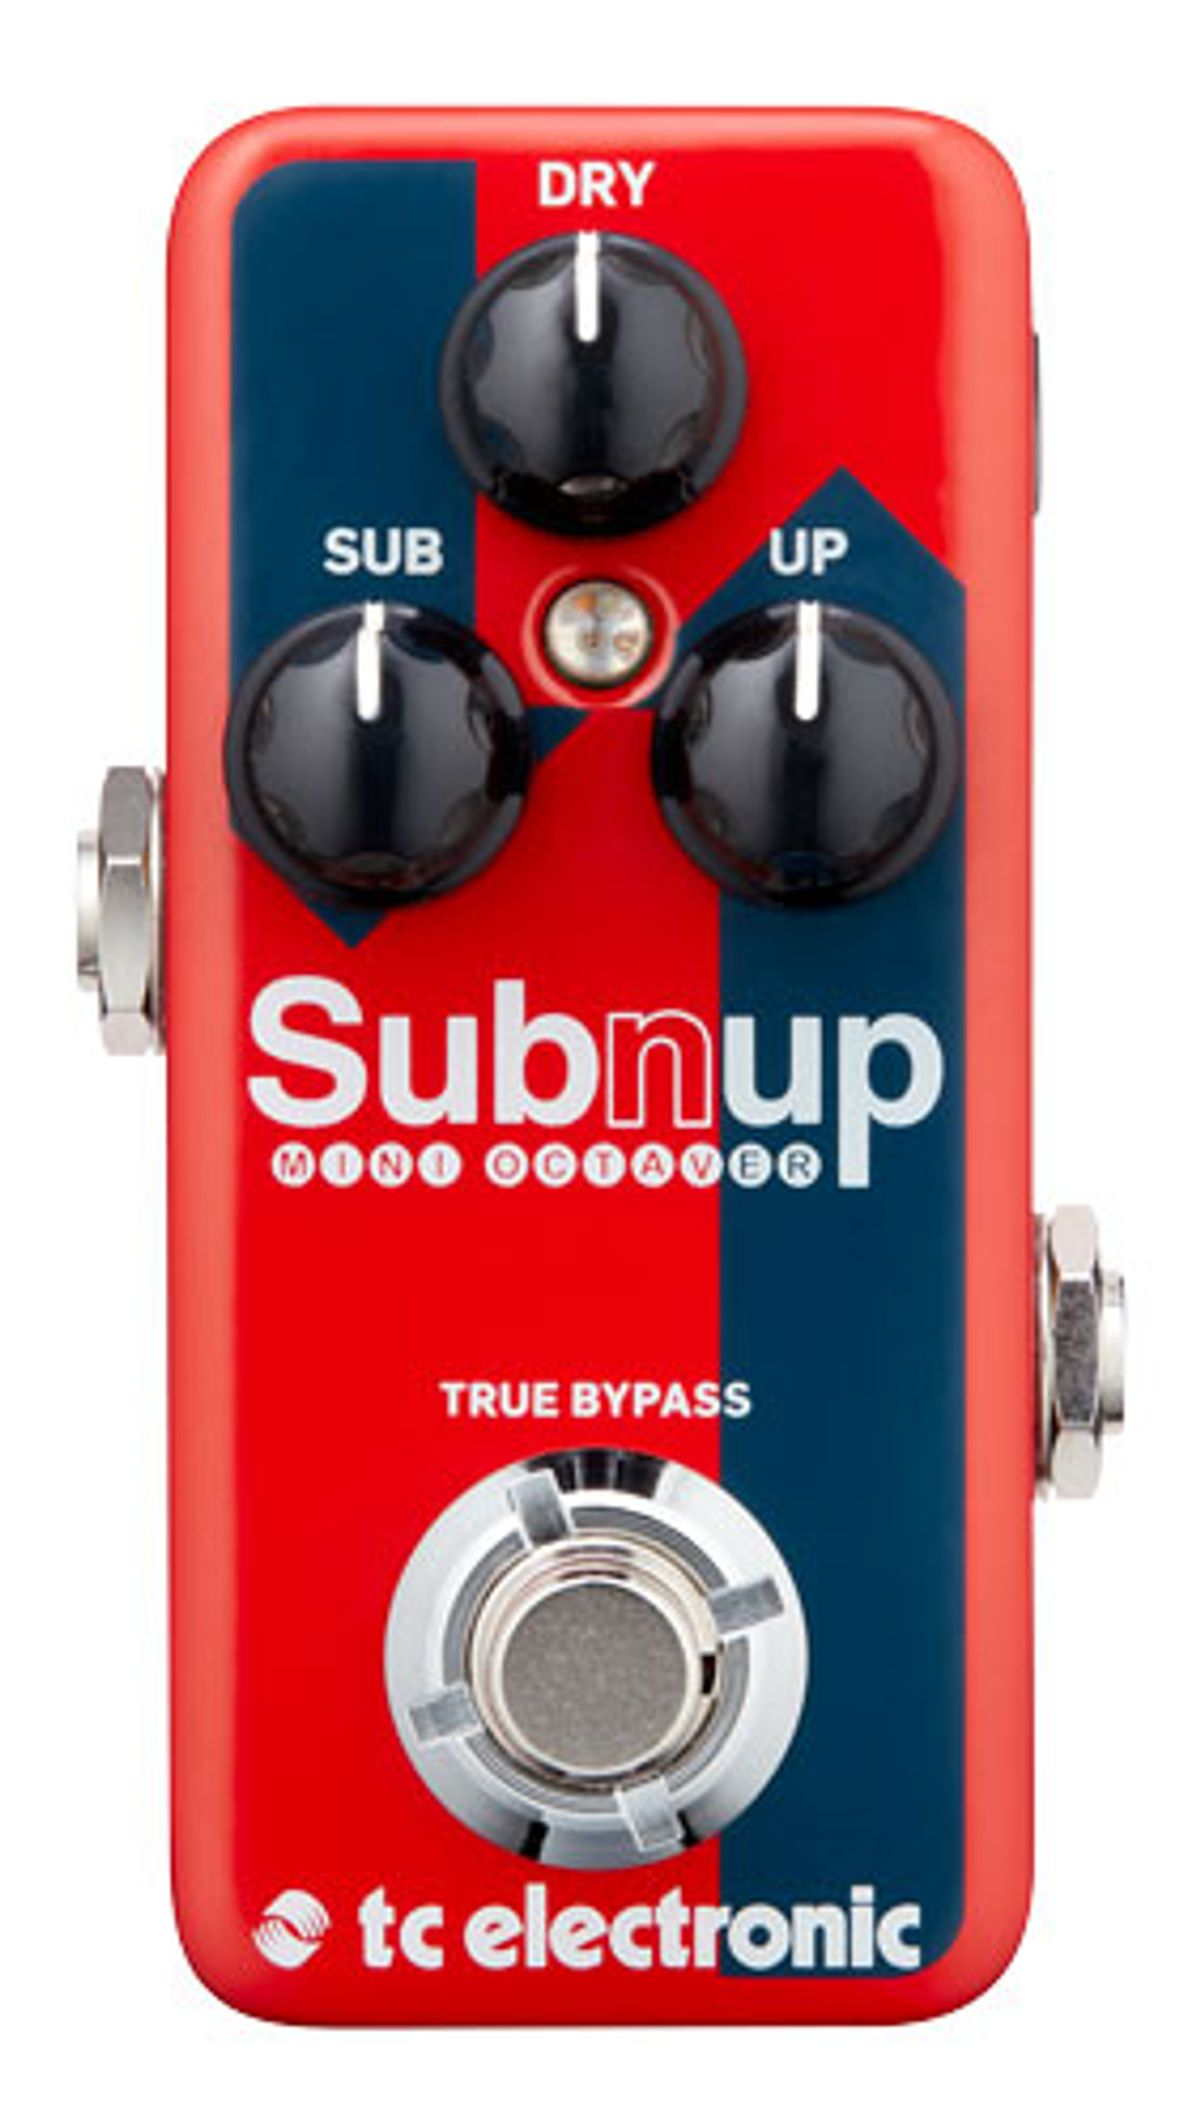 TC Electronic Presents the Sub 'N' Up Mini